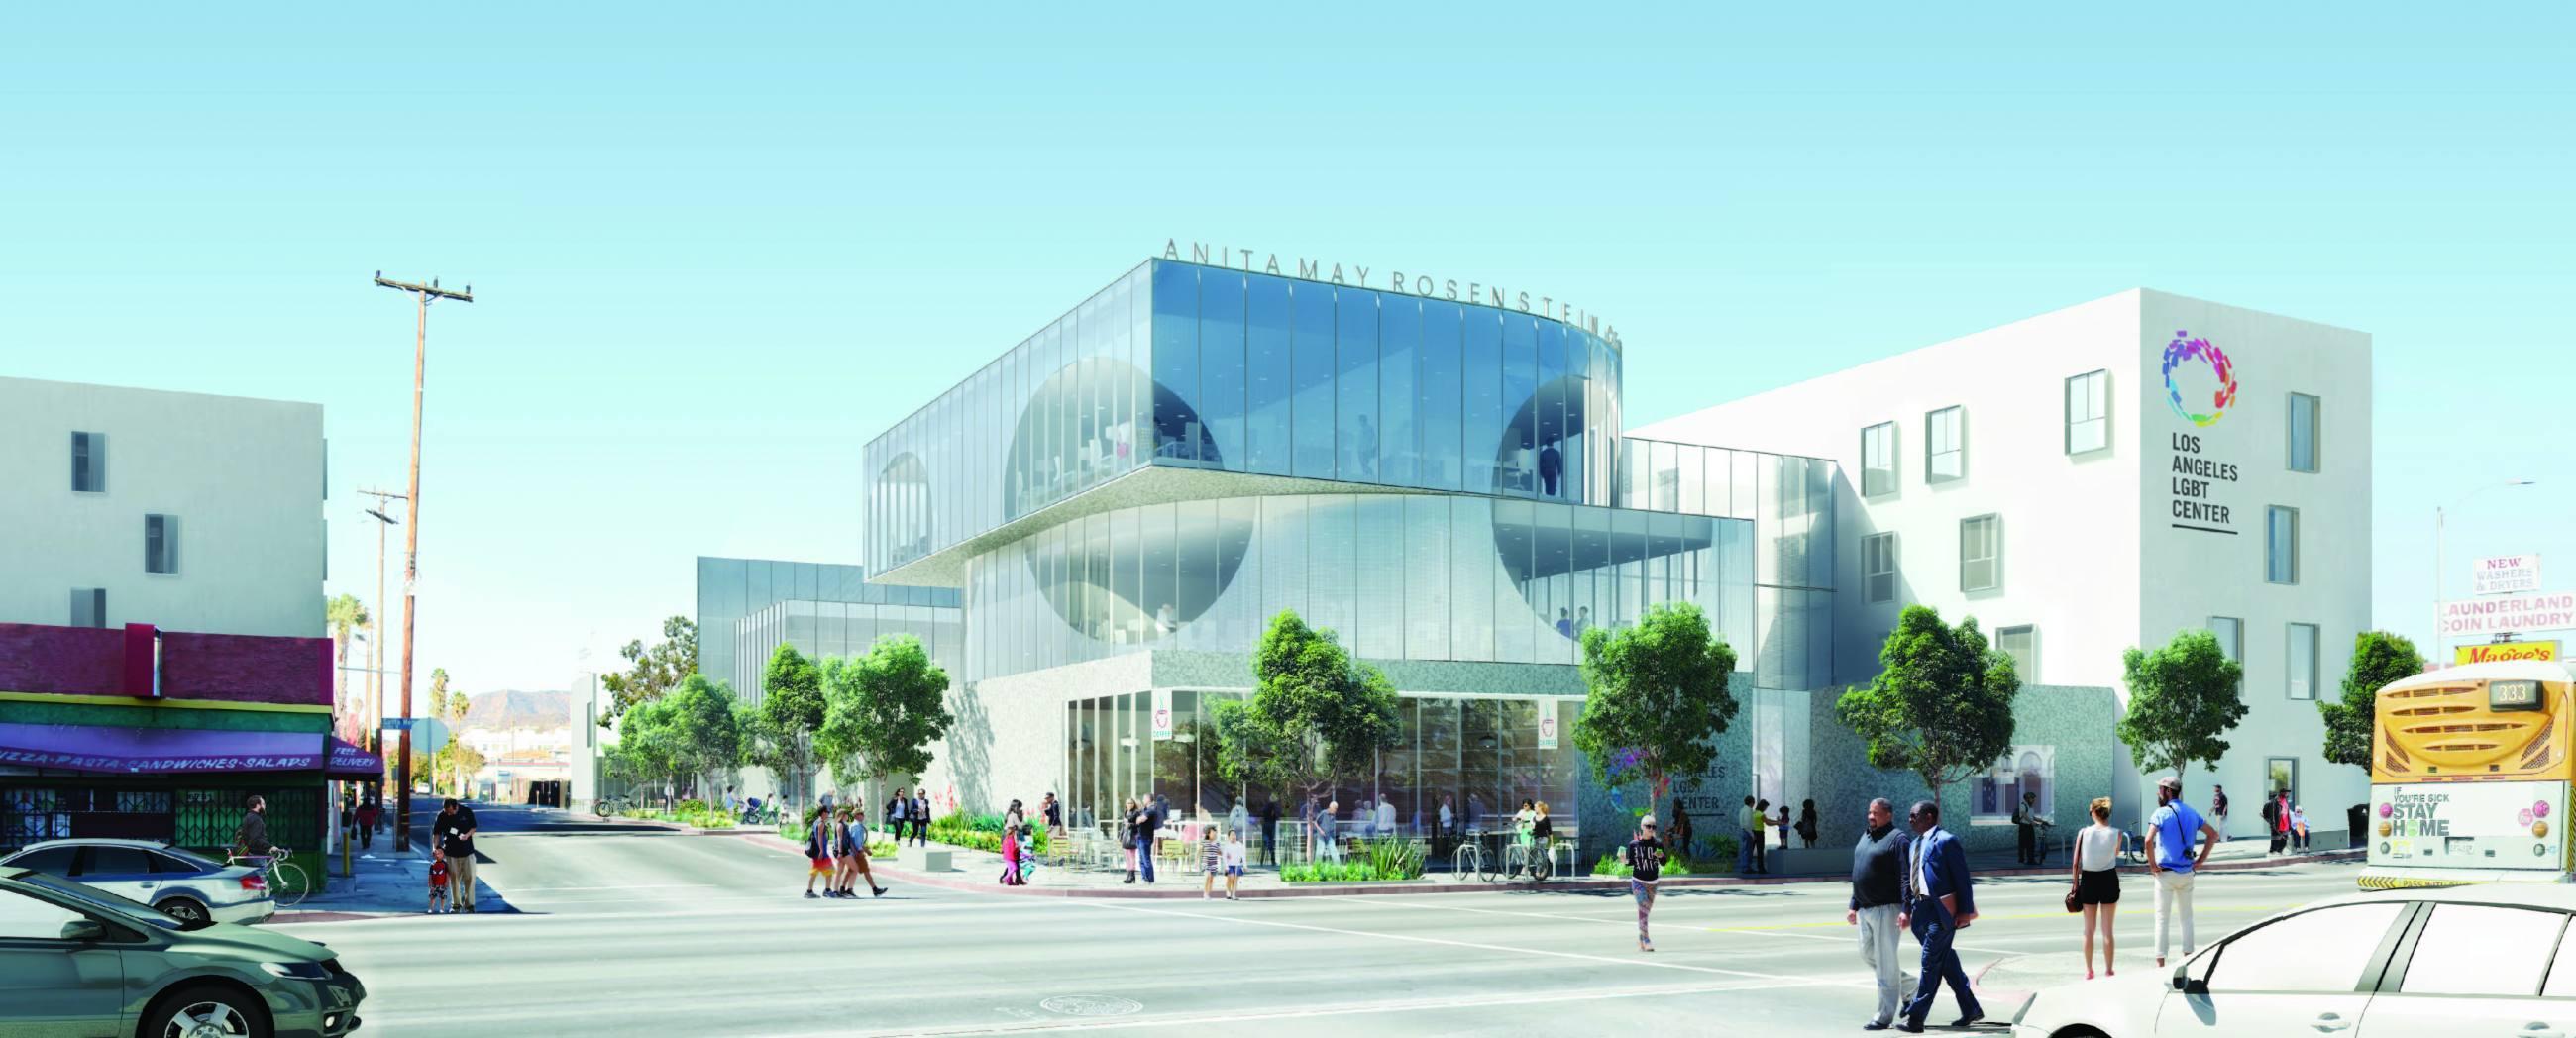 Anita May Rosenstein Campus at the Los Angeles LGBT Center